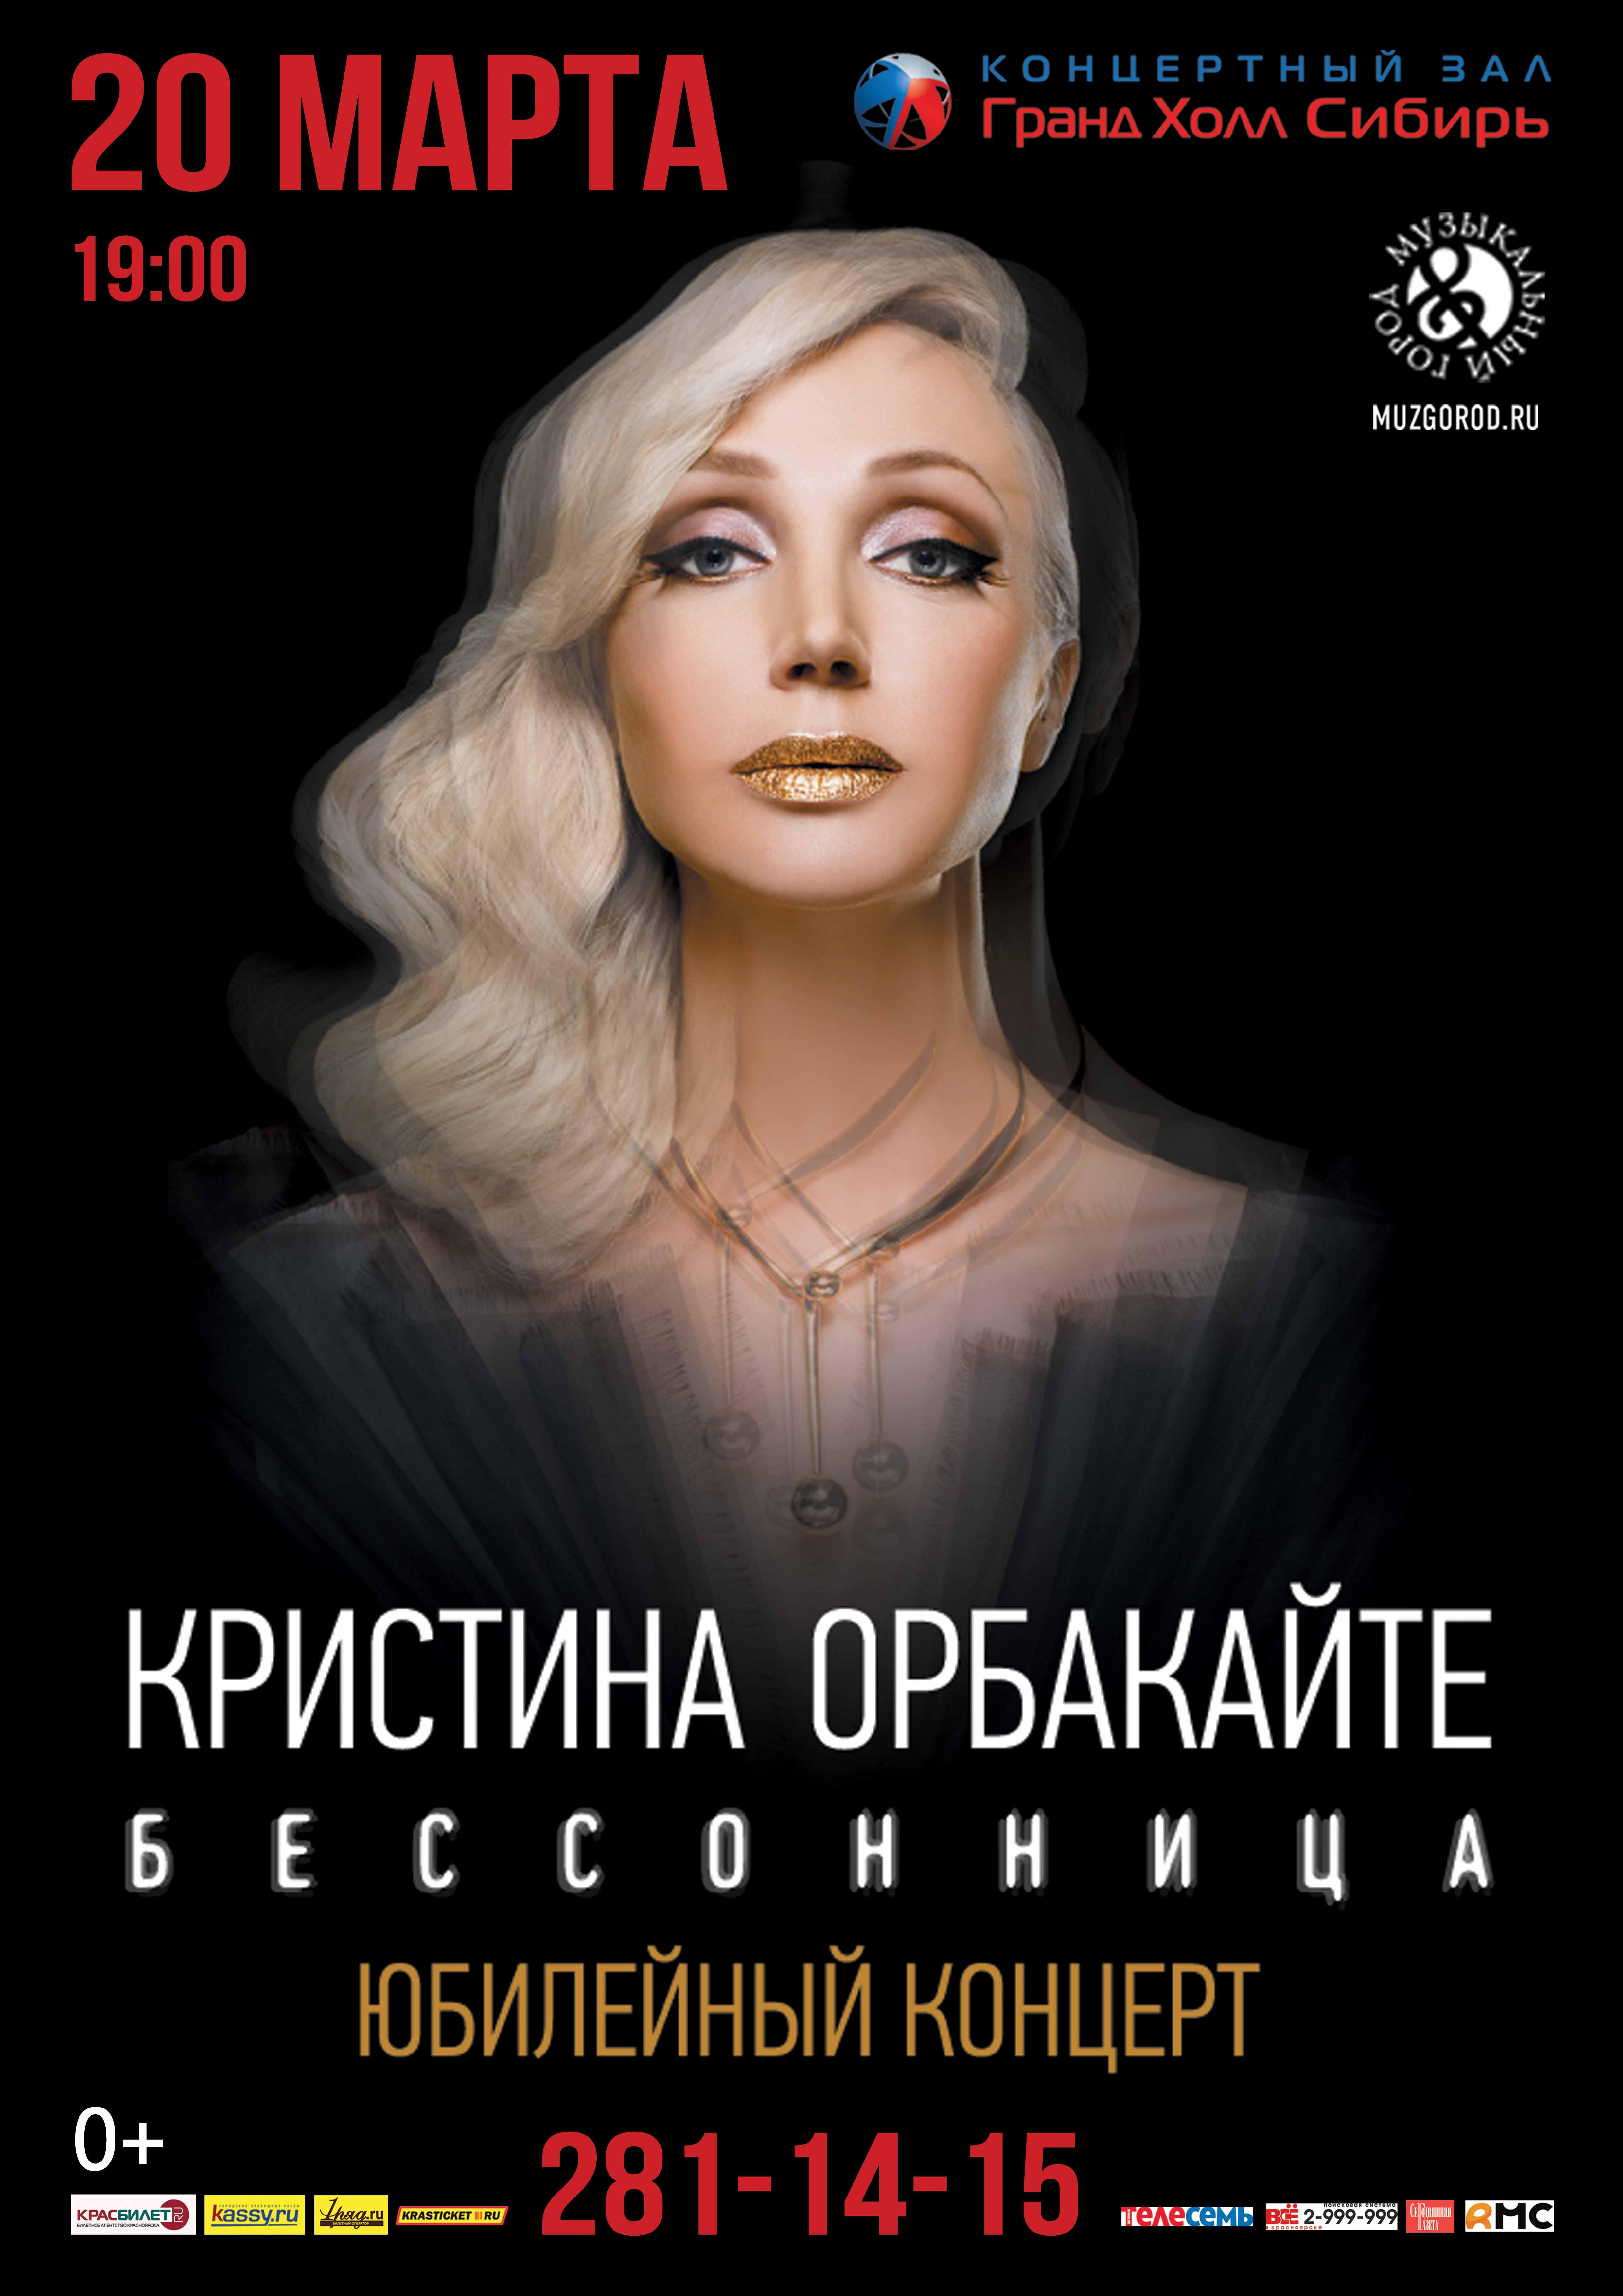 Кристина Орбакайте в Красноярске!